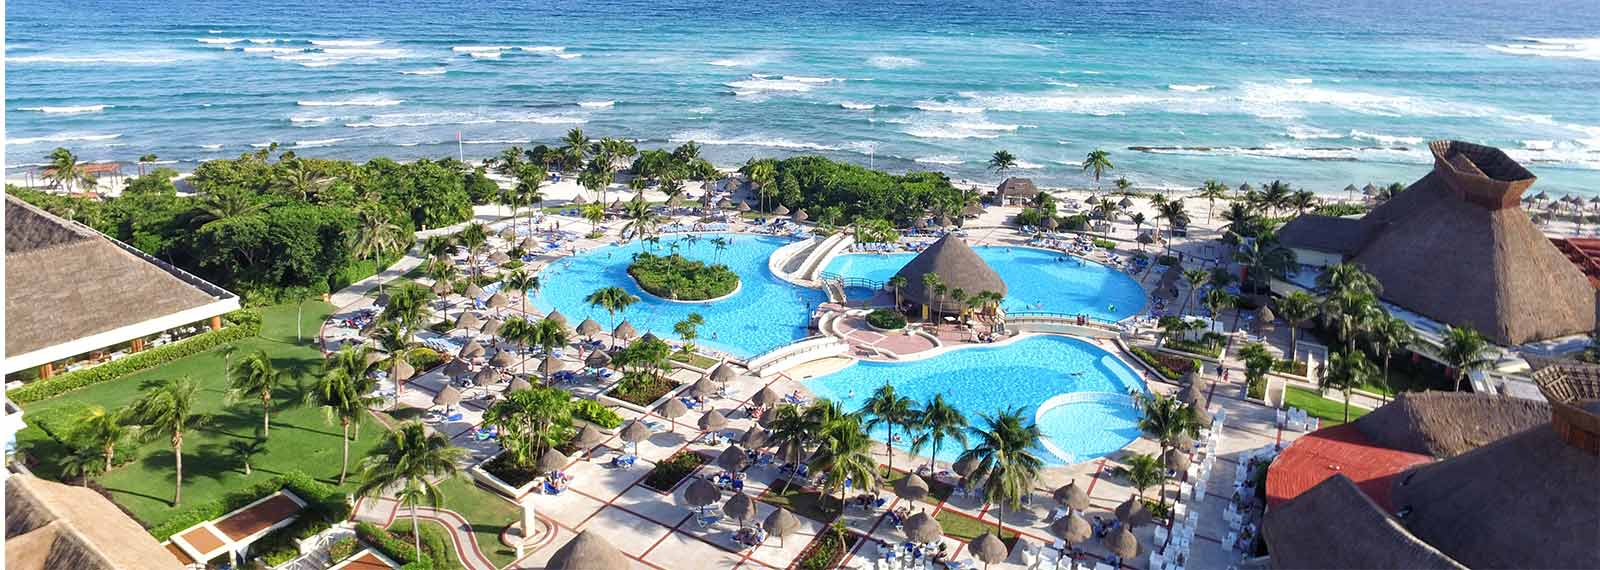 Bahia Principe - destination photo